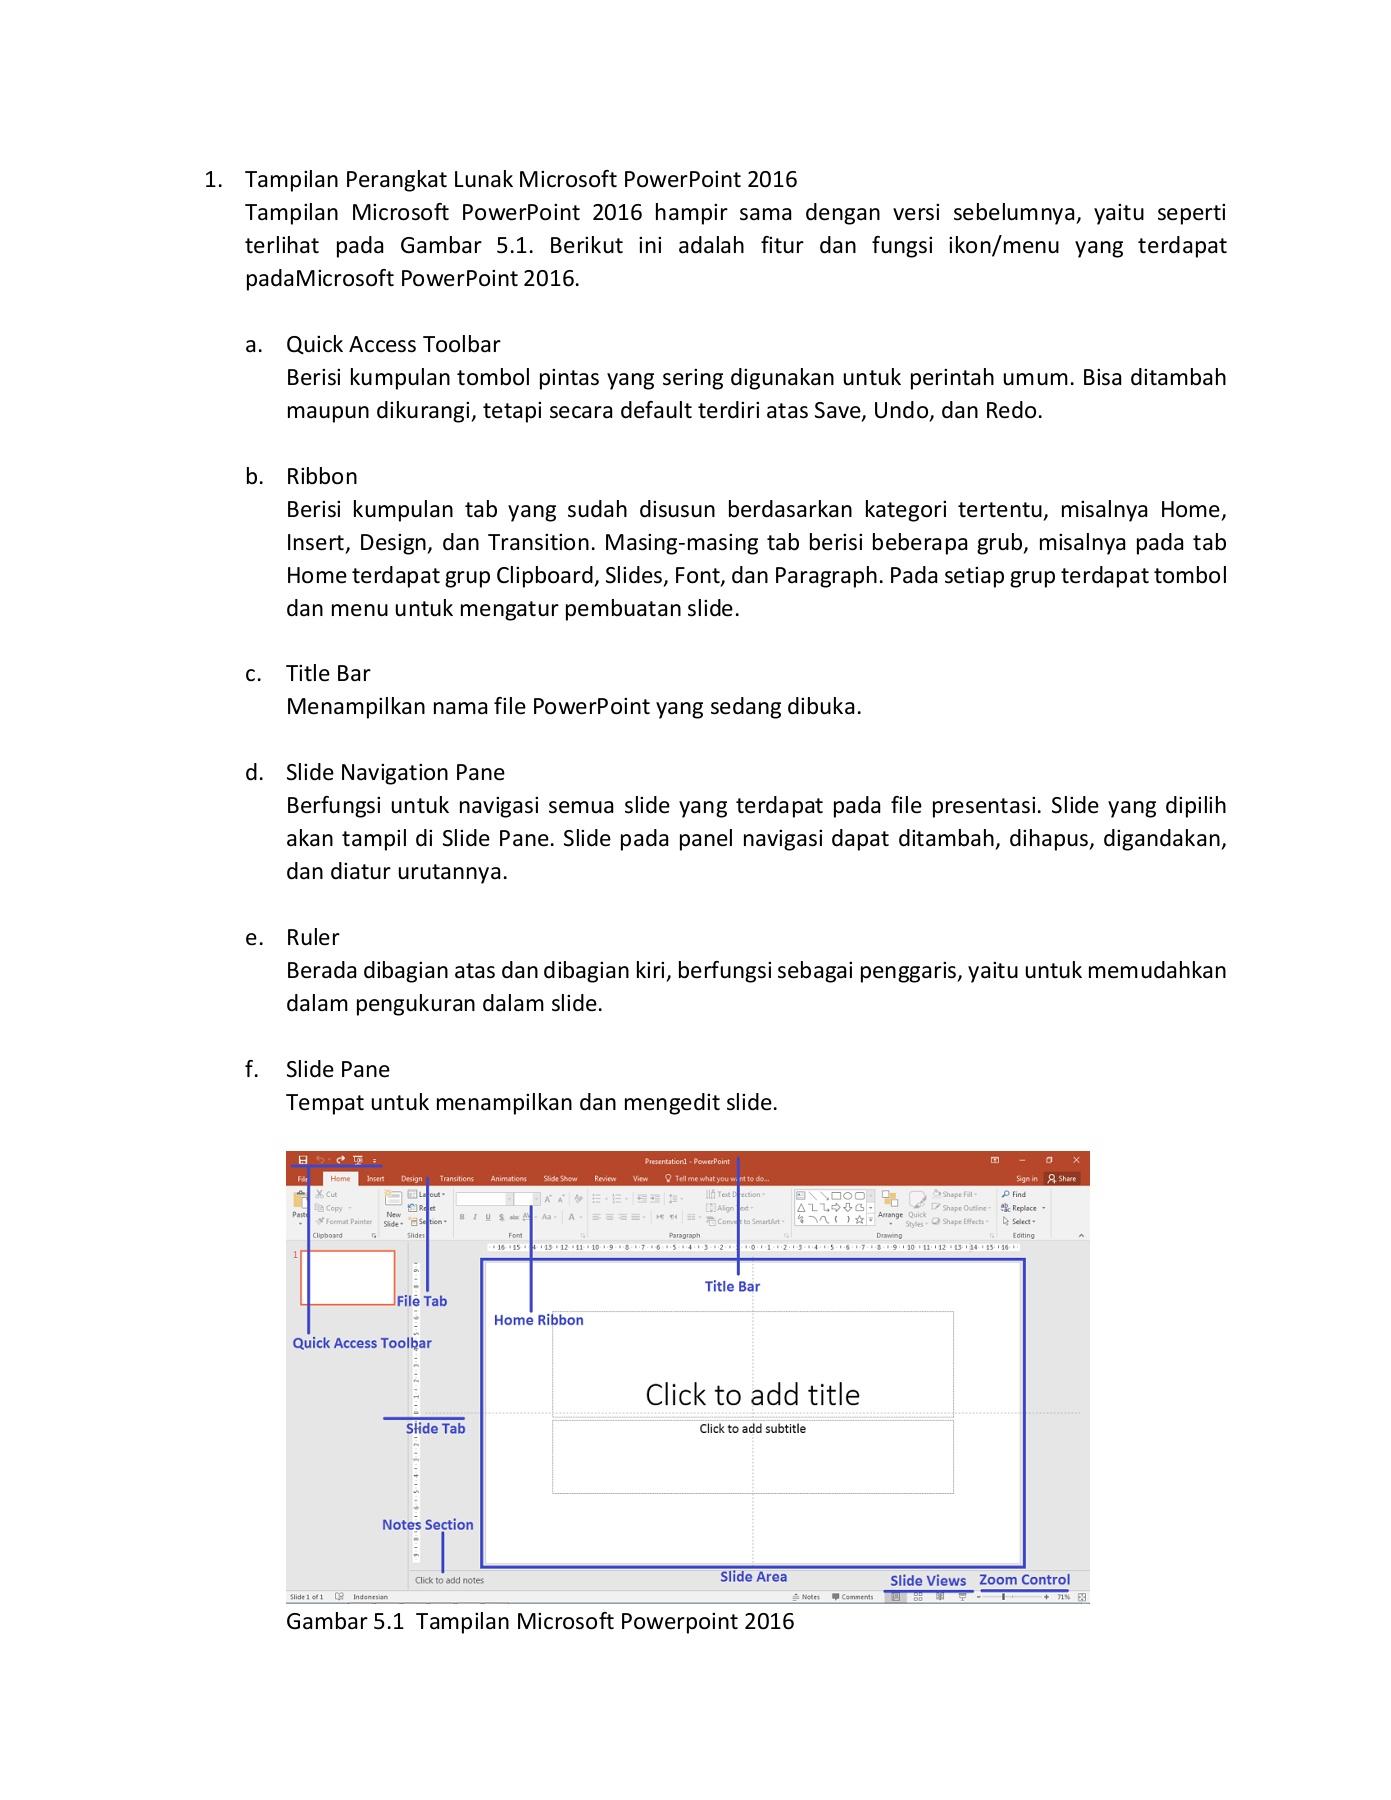 Fungsi Ribbon Pada Microsoft Powerpoint : fungsi, ribbon, microsoft, powerpoint, Perangkat, Lunak, Pembuat, Slide, Presentasi-Flip, EBook, Pages, AnyFlip